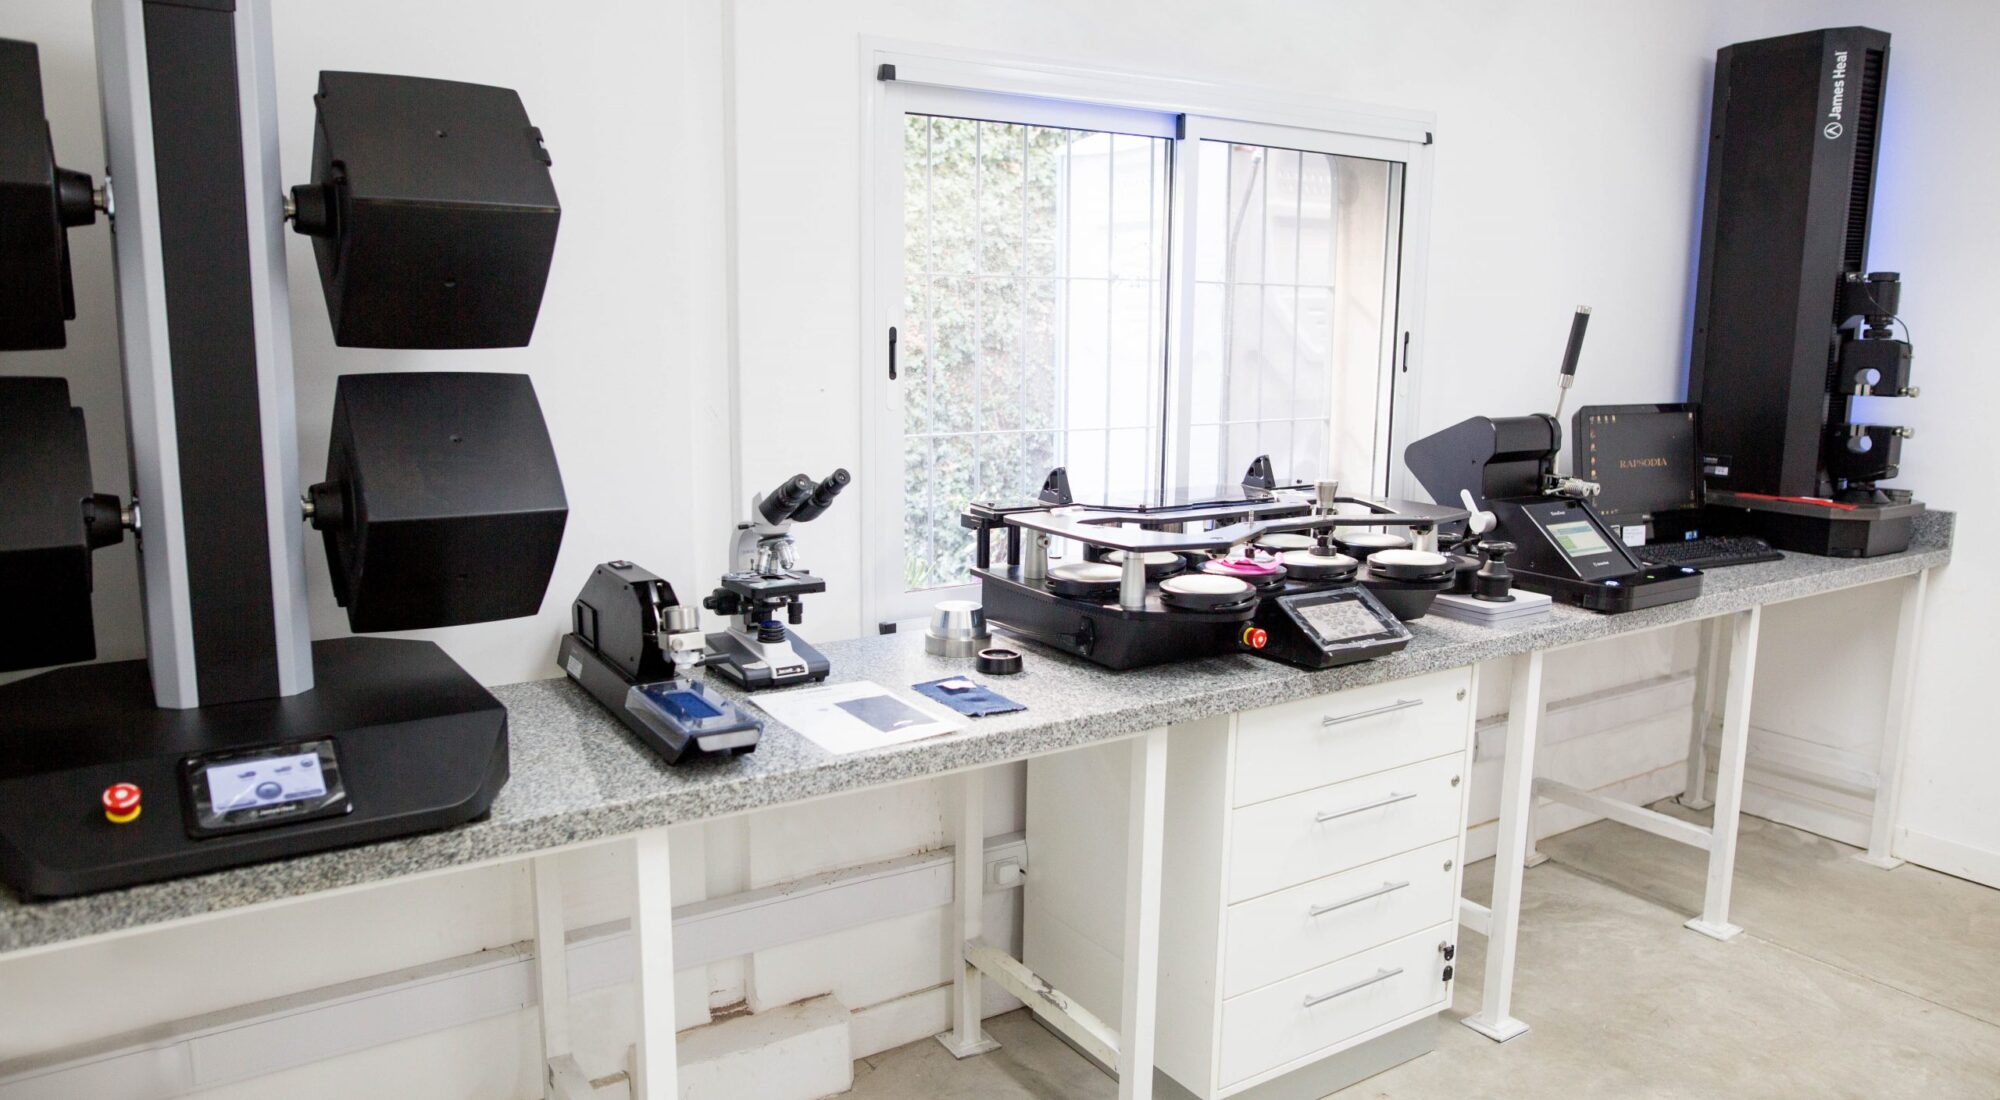 Rapsodia Lab with James Heal Instruments